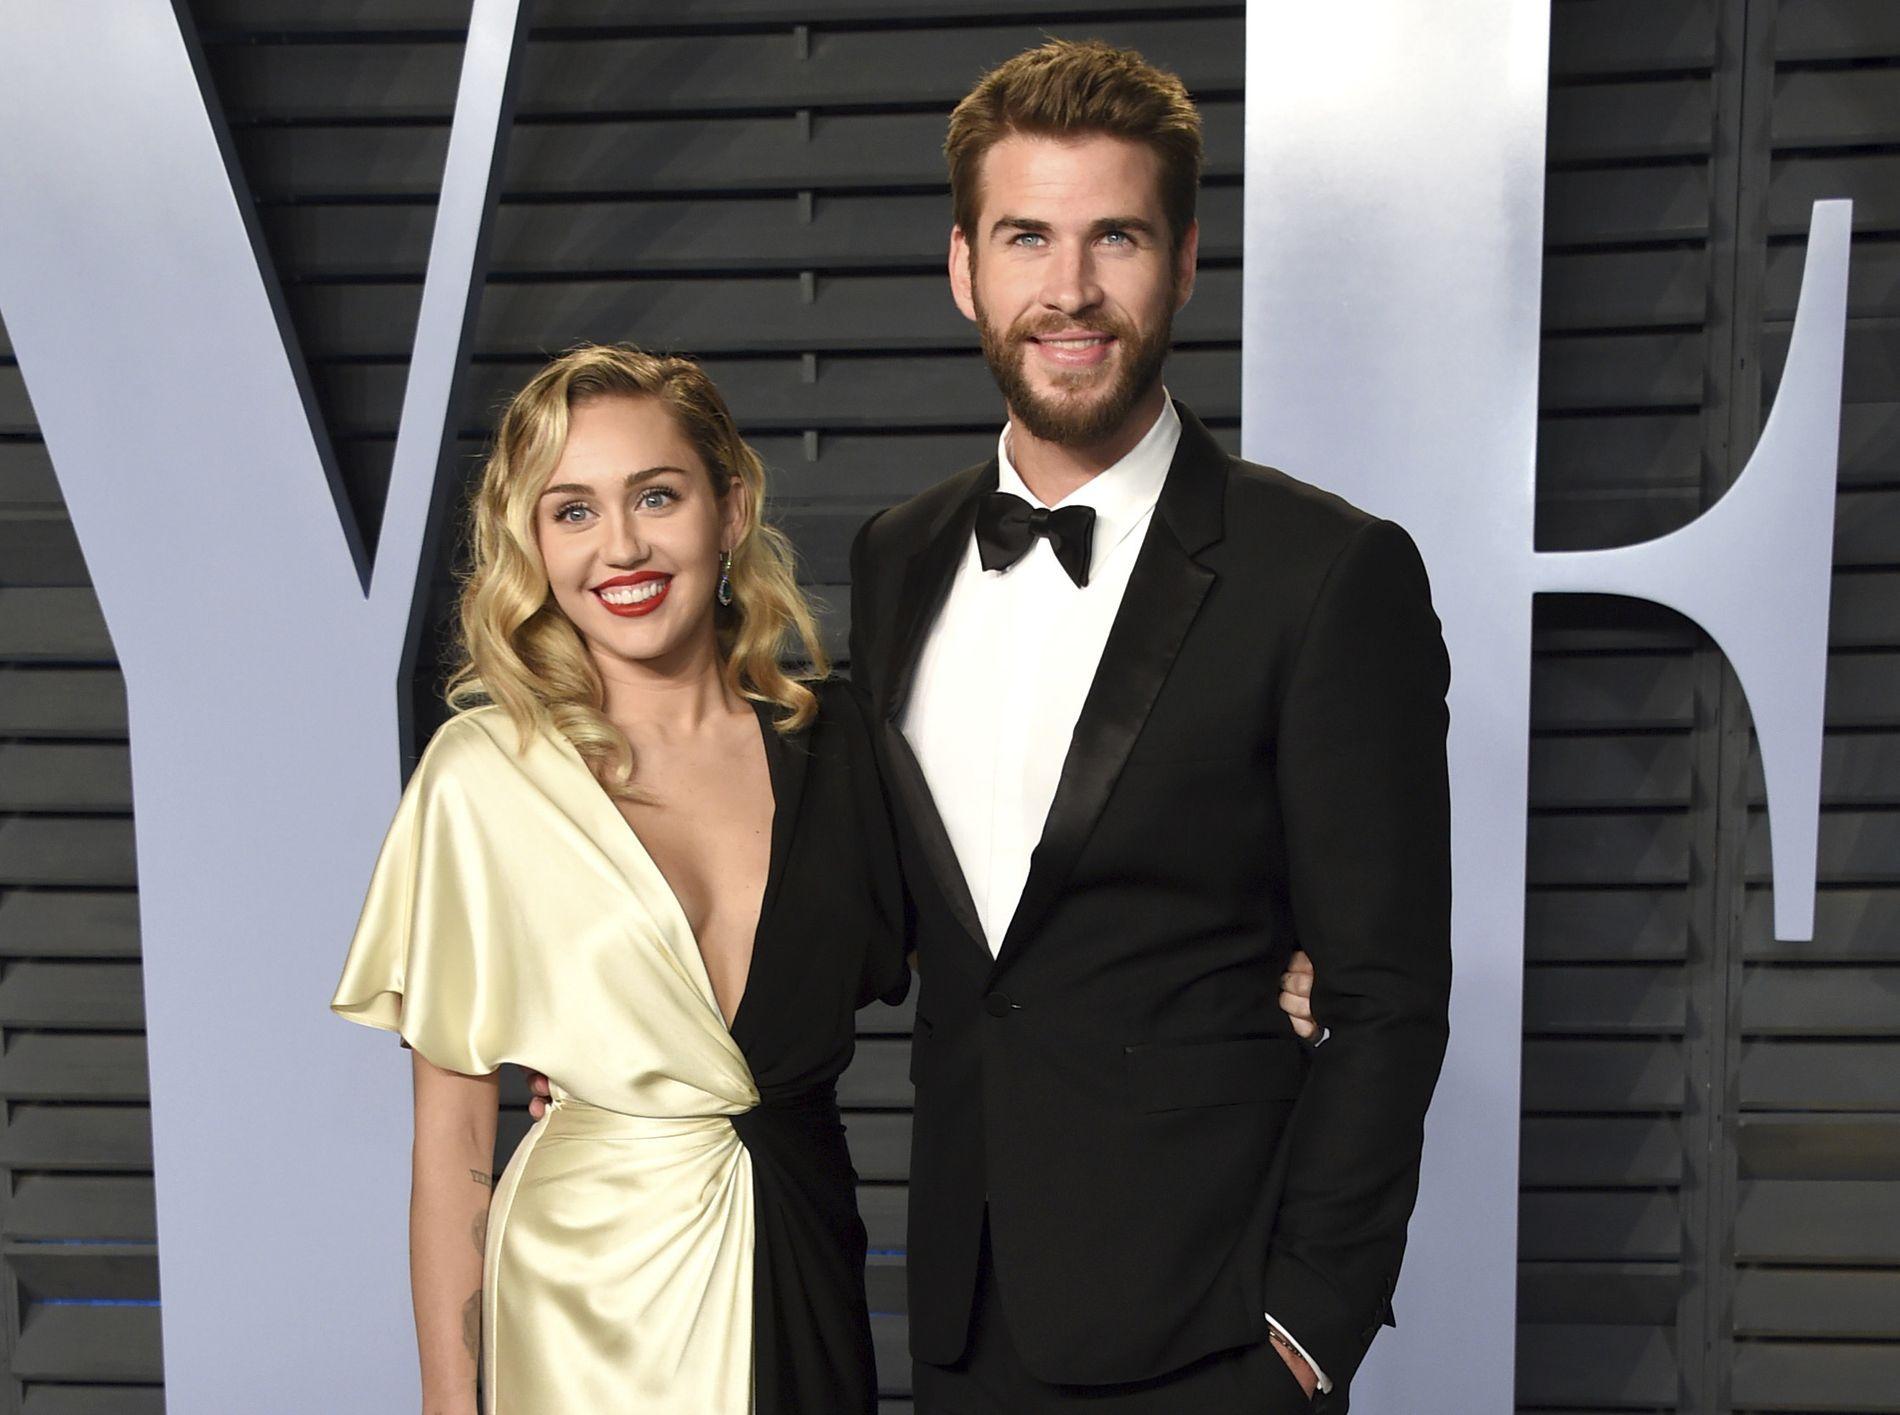 PROFILERT PAR: Artist Miley Cyrus (26) og skuespiller Liam Hemsworth (28) sammen på Vanity Fairs Oscar-fest tidligere i år.